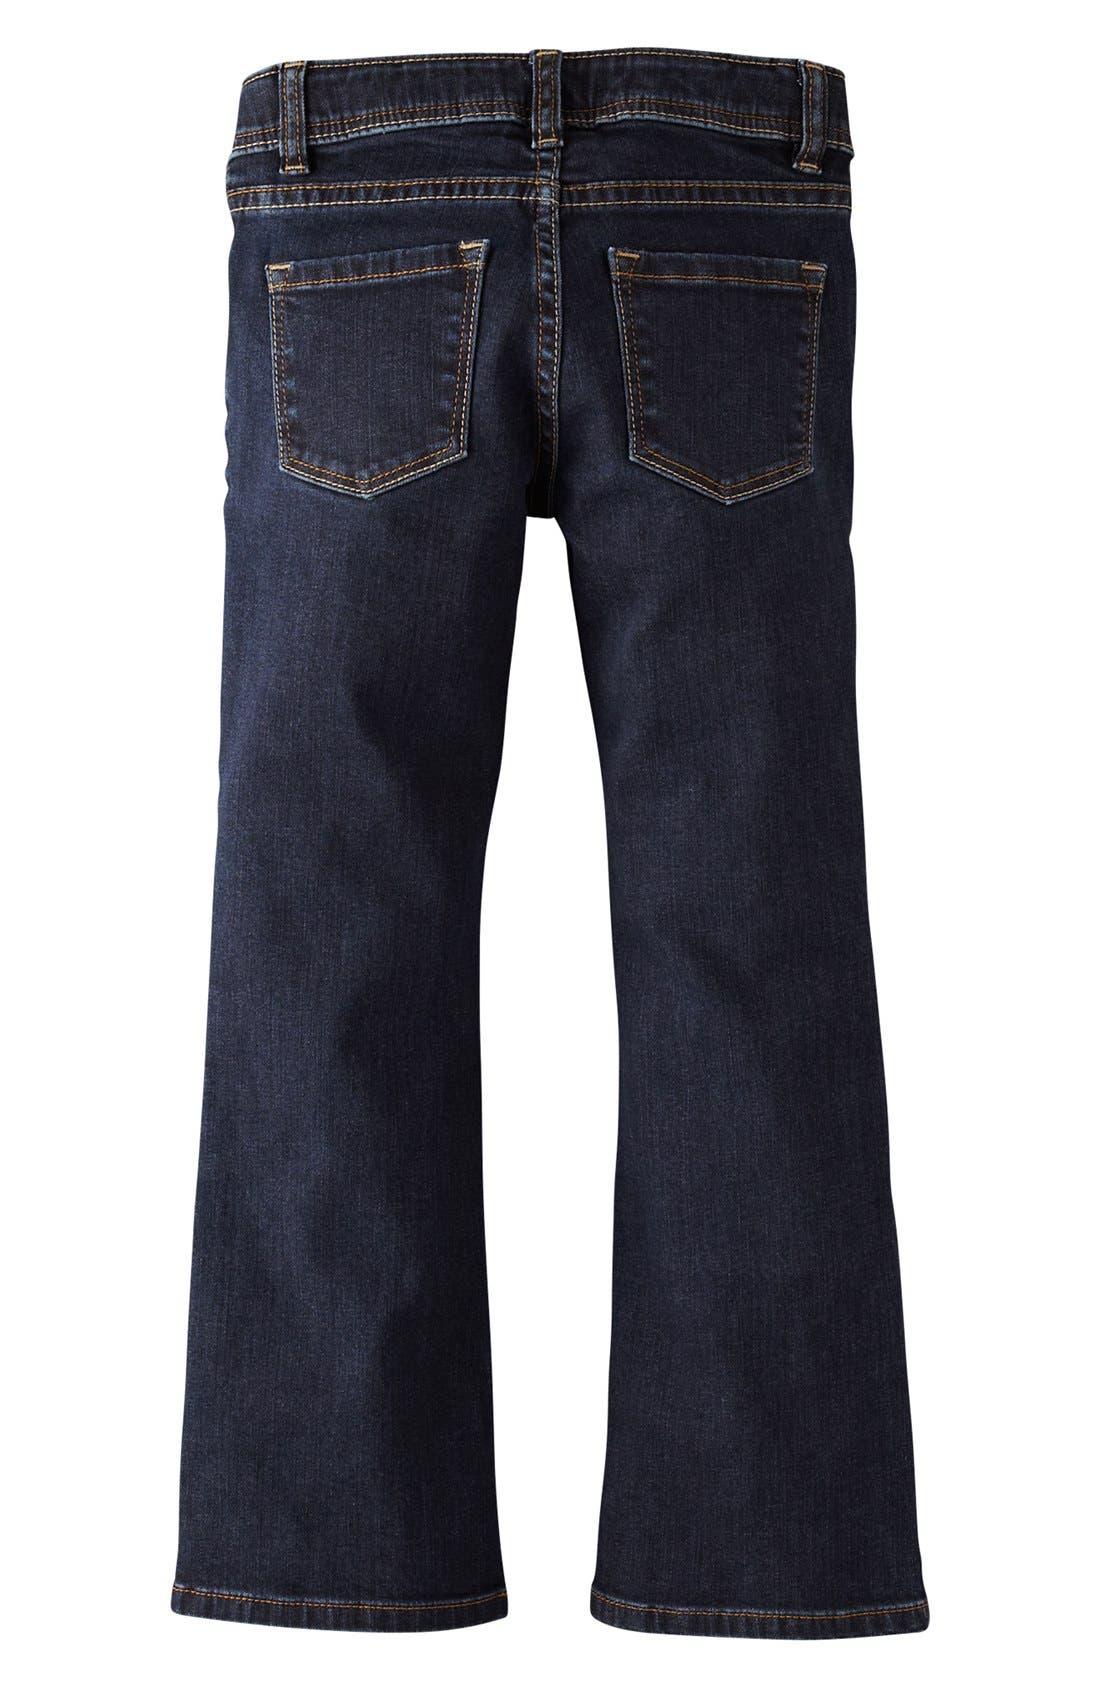 Main Image - Mini Boden Bootcut Jeans (Little Girls & Big Girls)